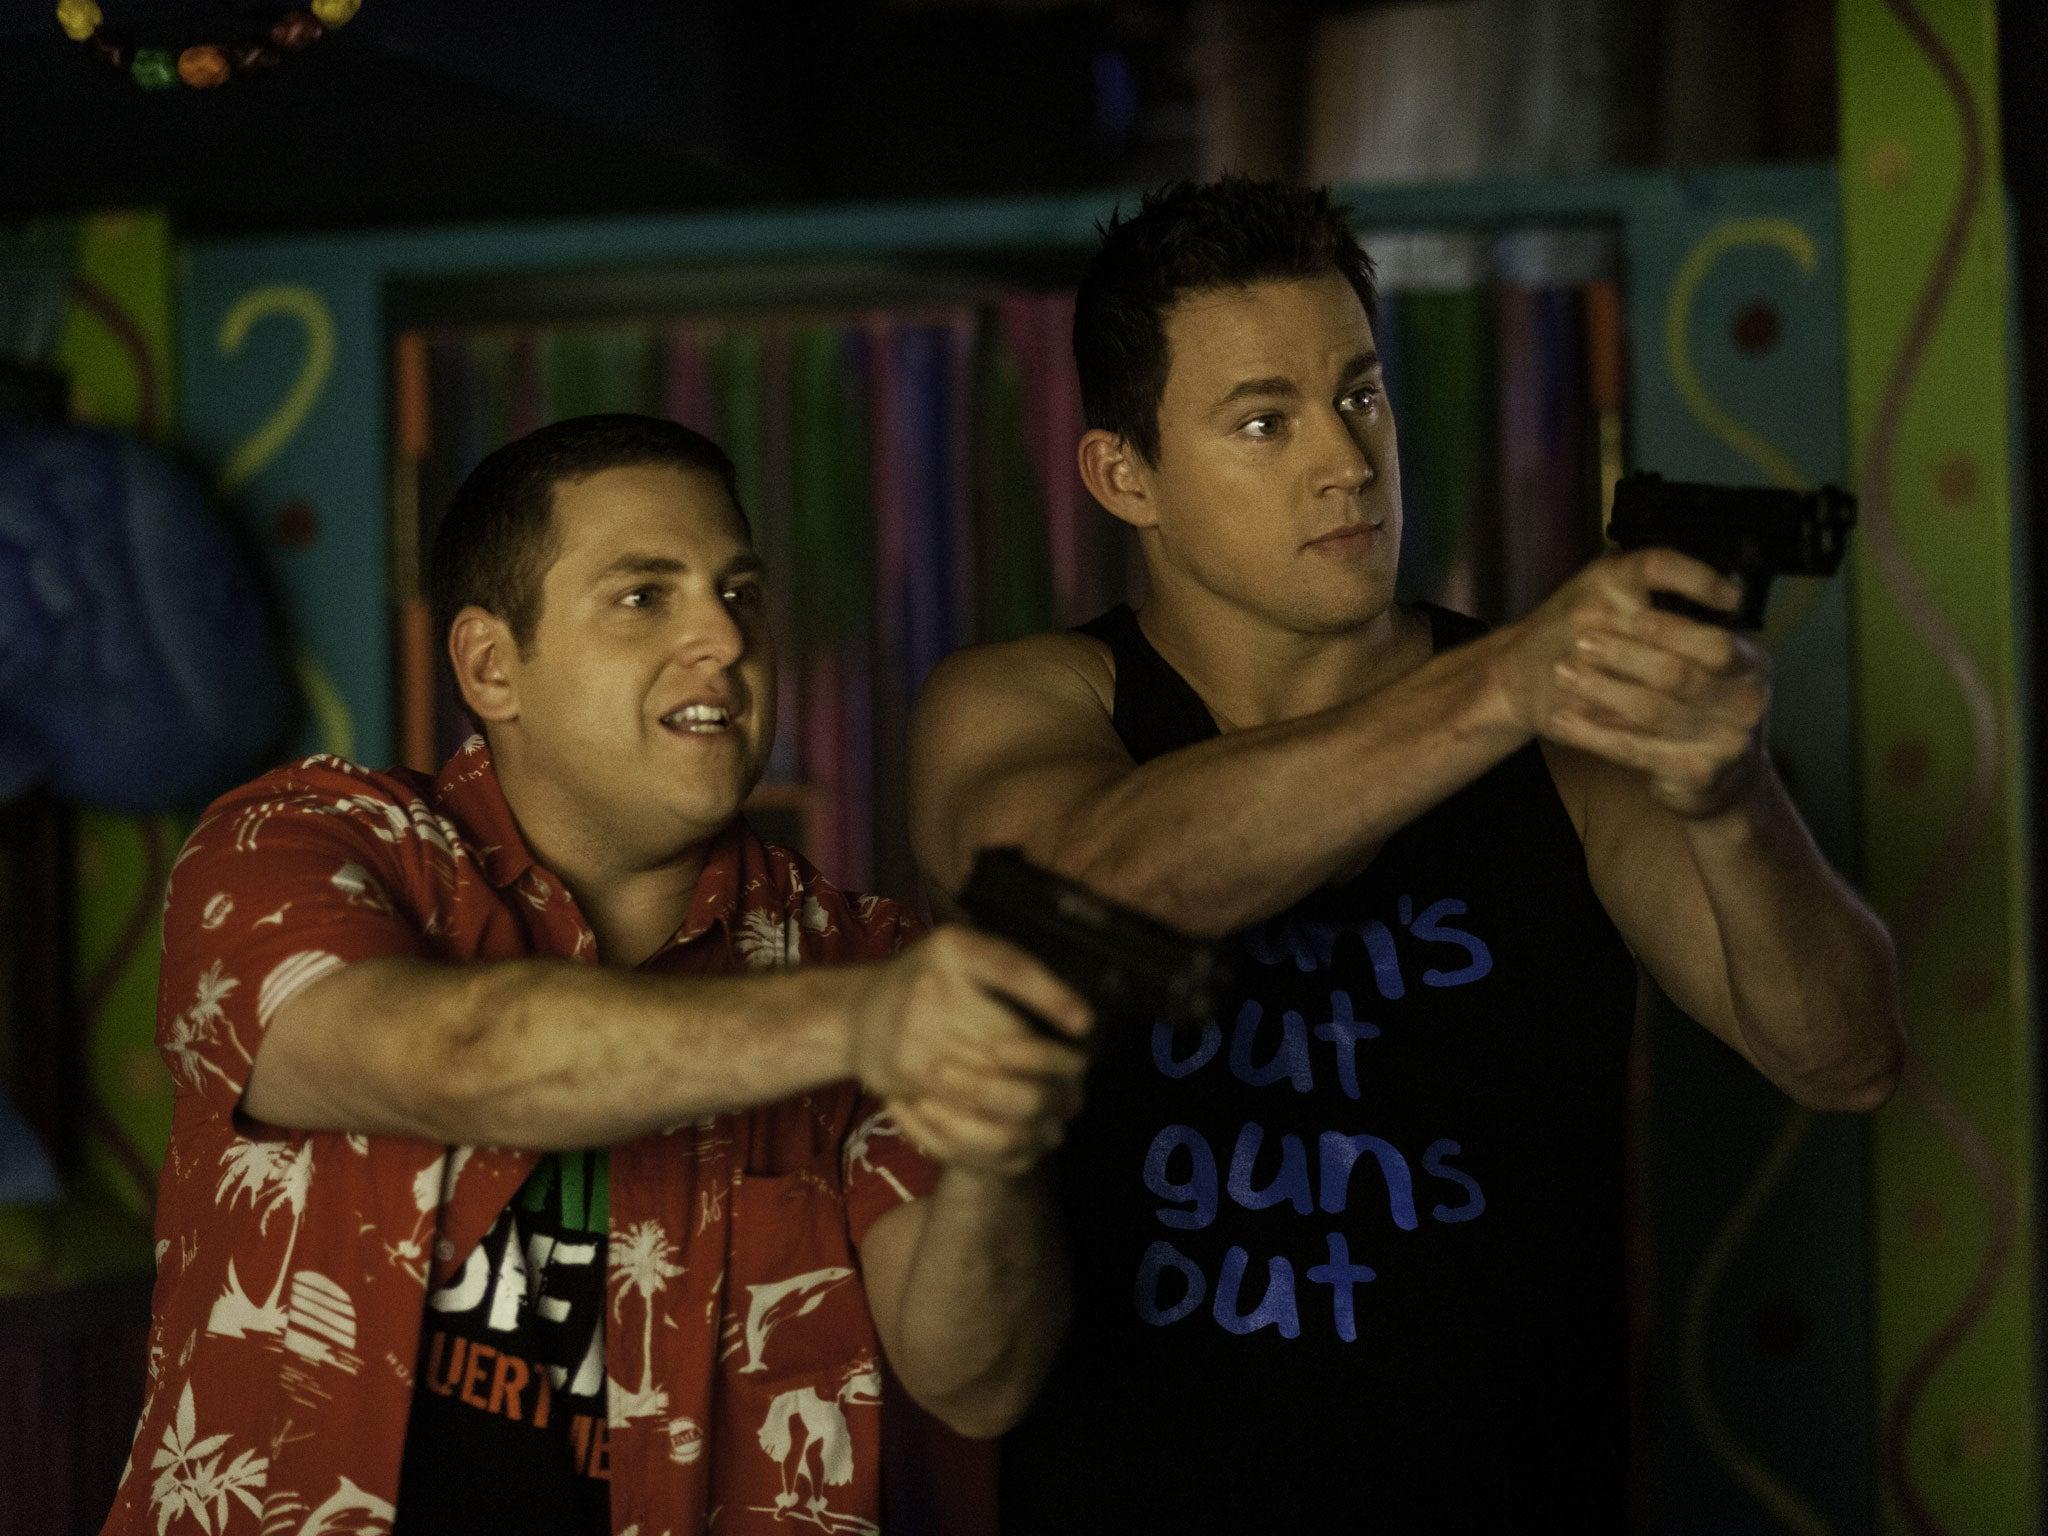 23 Jump Street Jonah Hill And Channing Tatum Set To Return For 22